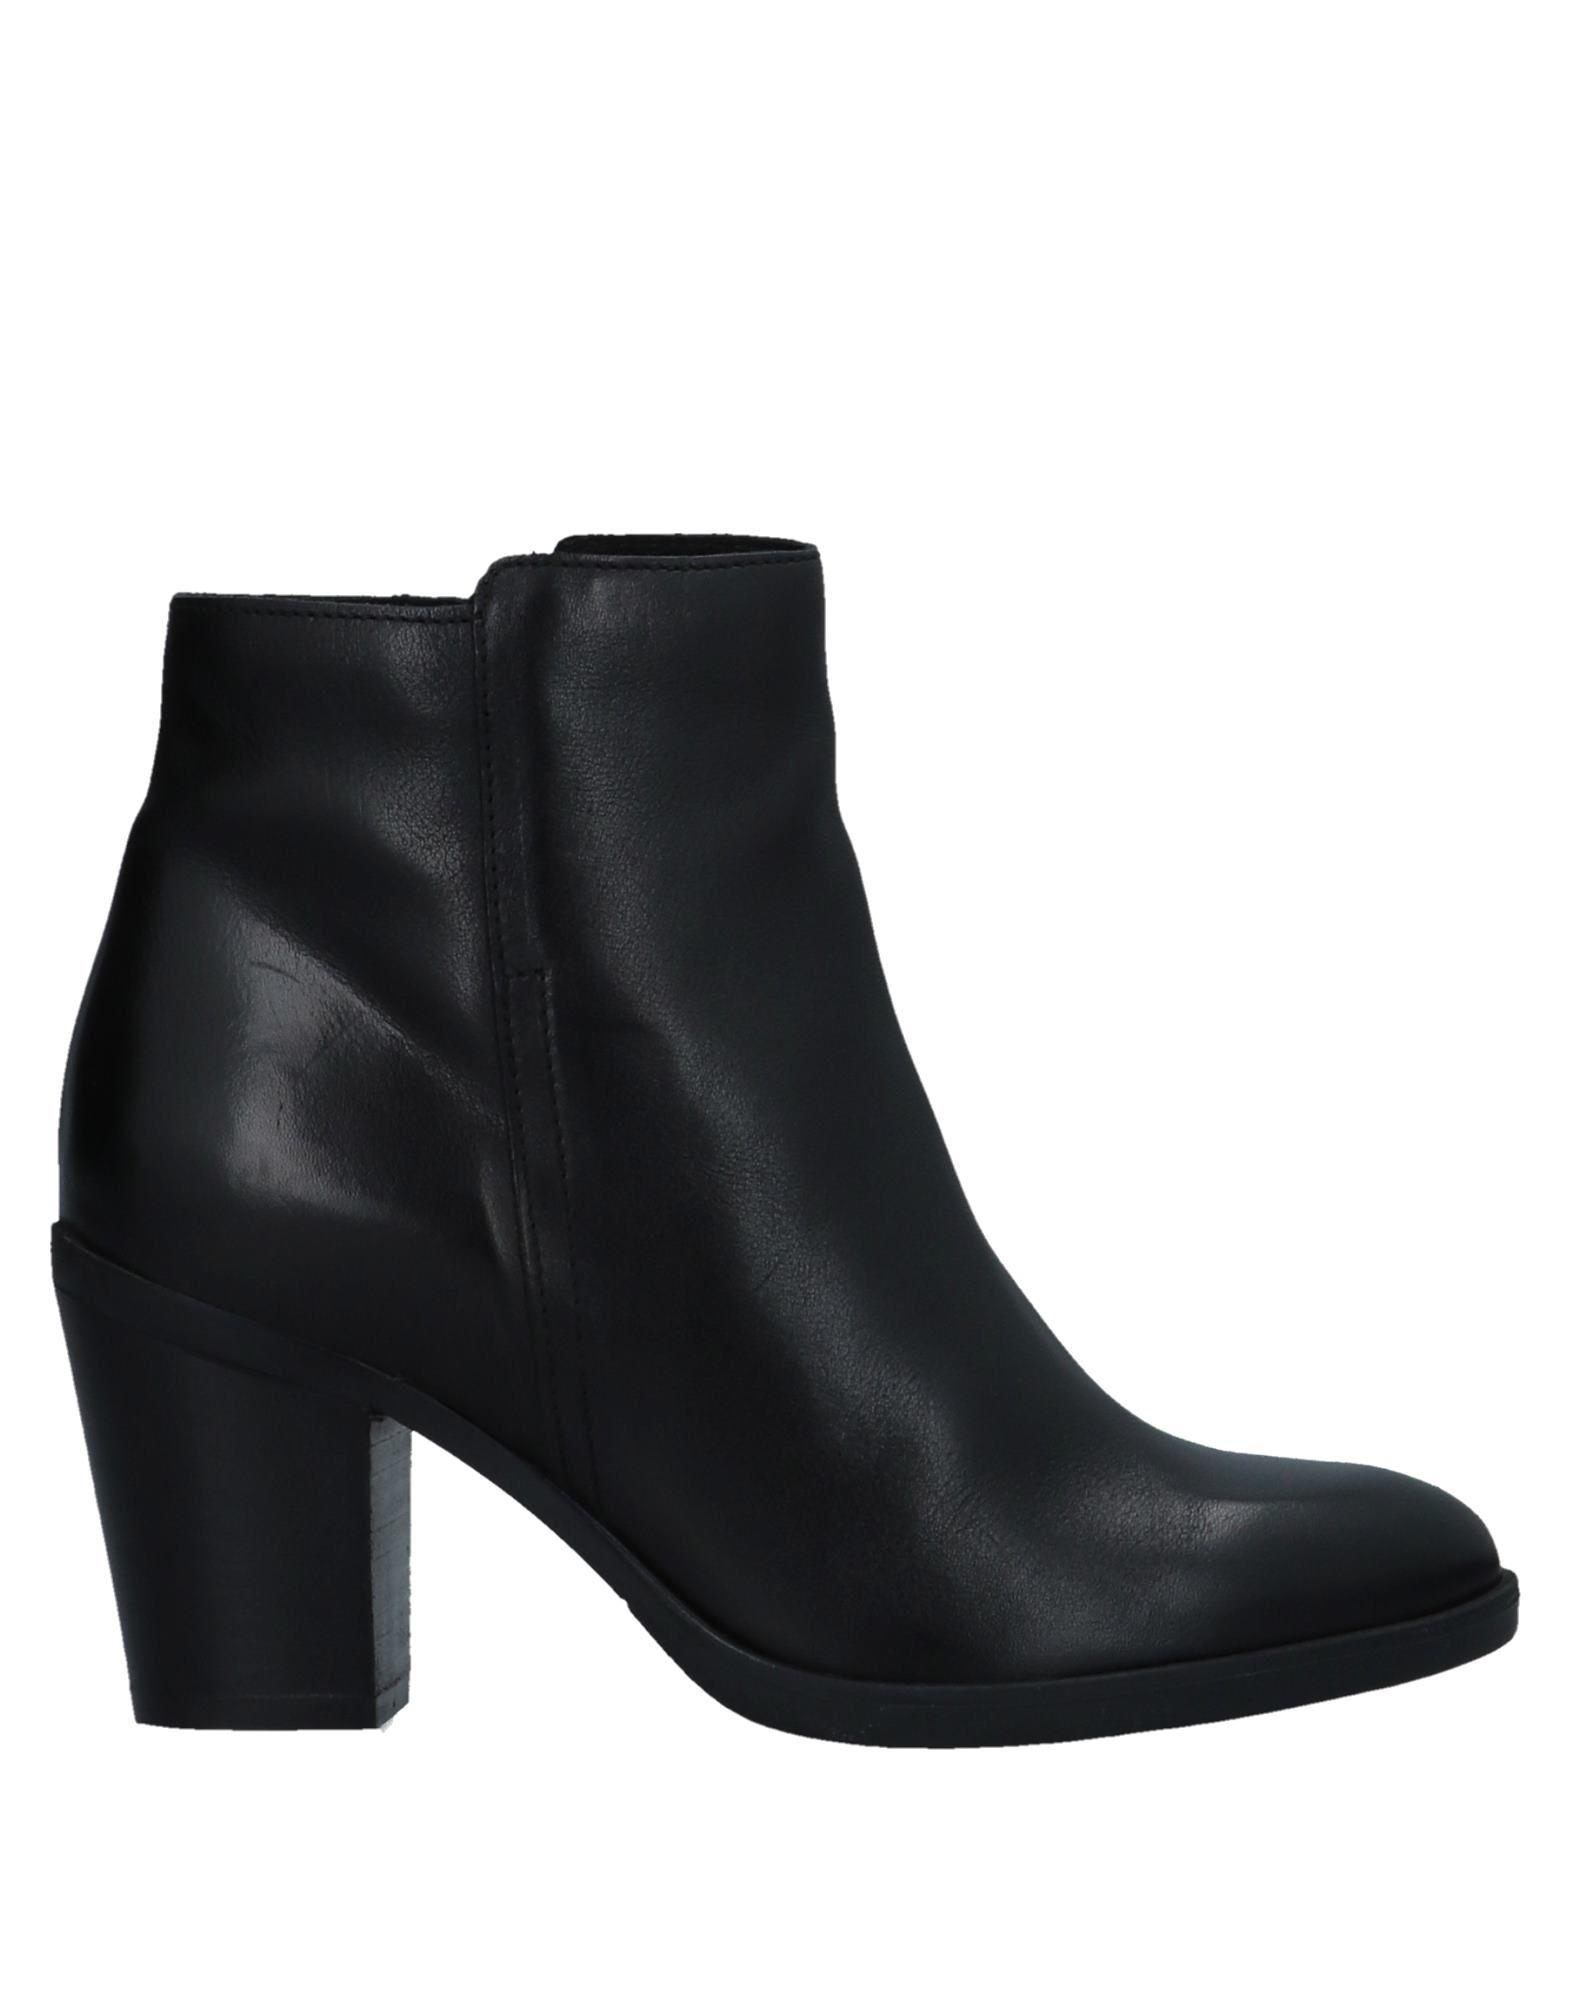 Carmens Stiefelette Damen  11537952FK Gute Qualität beliebte Schuhe